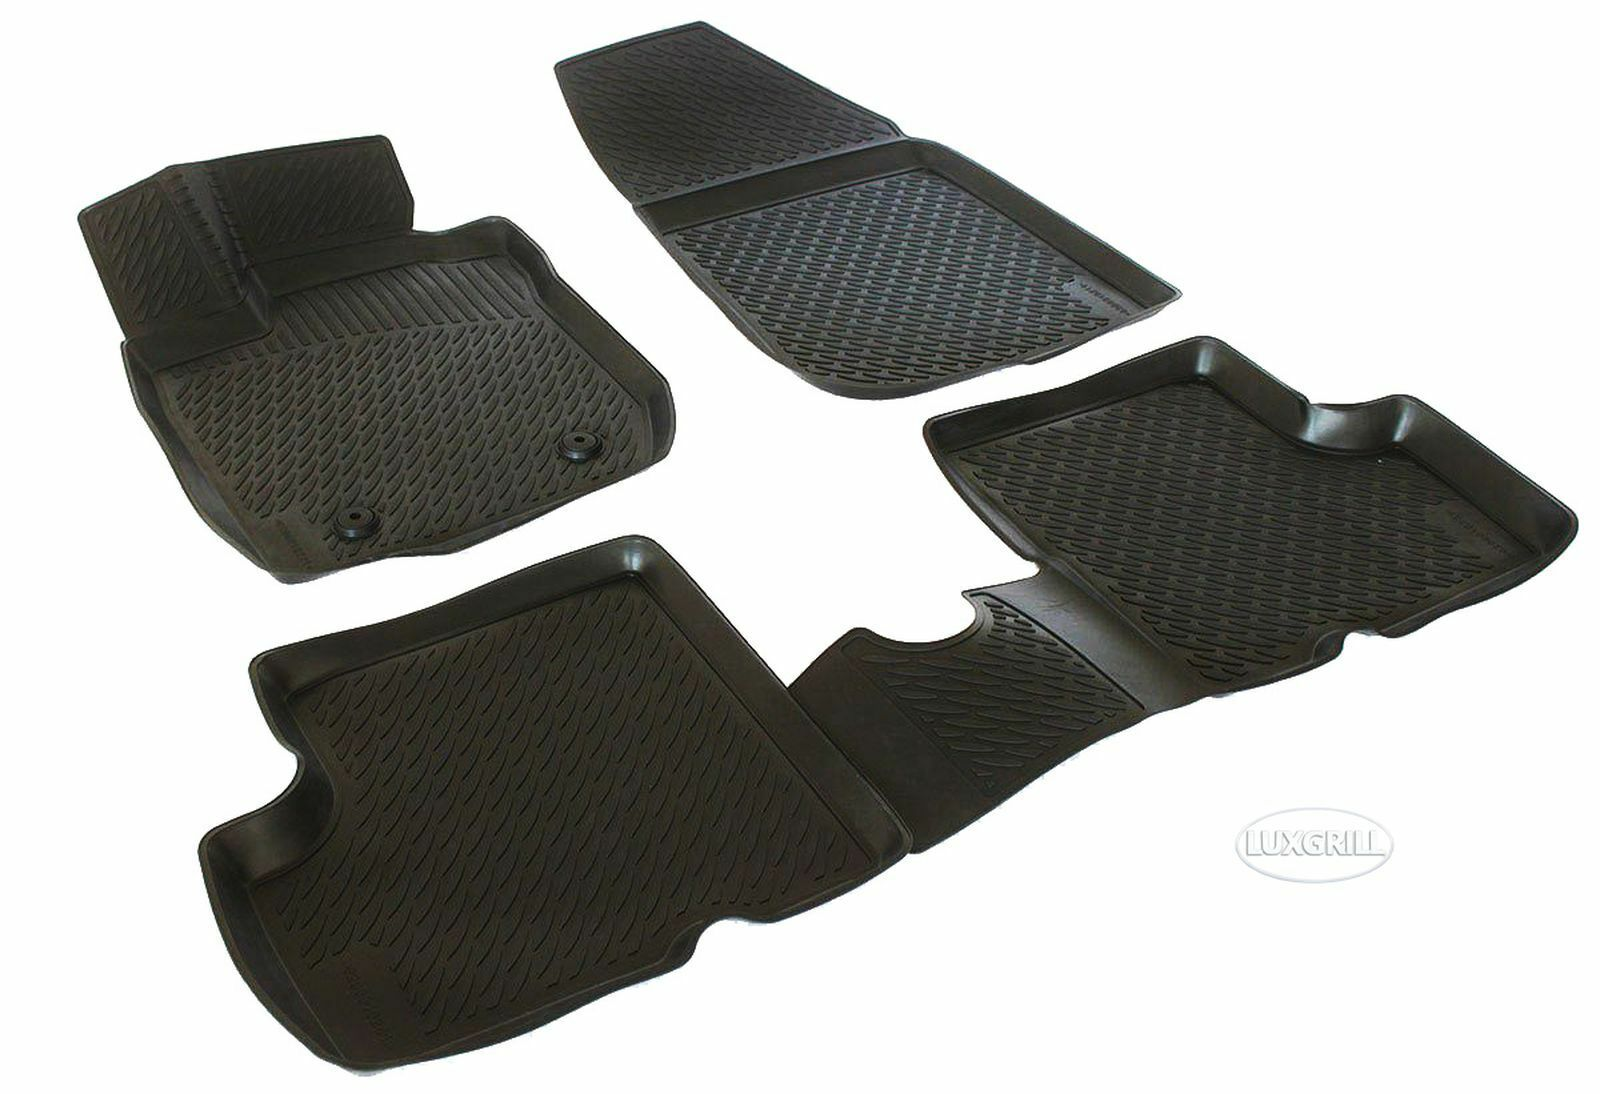 RMDA203401 Premium 3D Alfombrillas de Goma Alfombras TPE Dacia Duster 2010-14